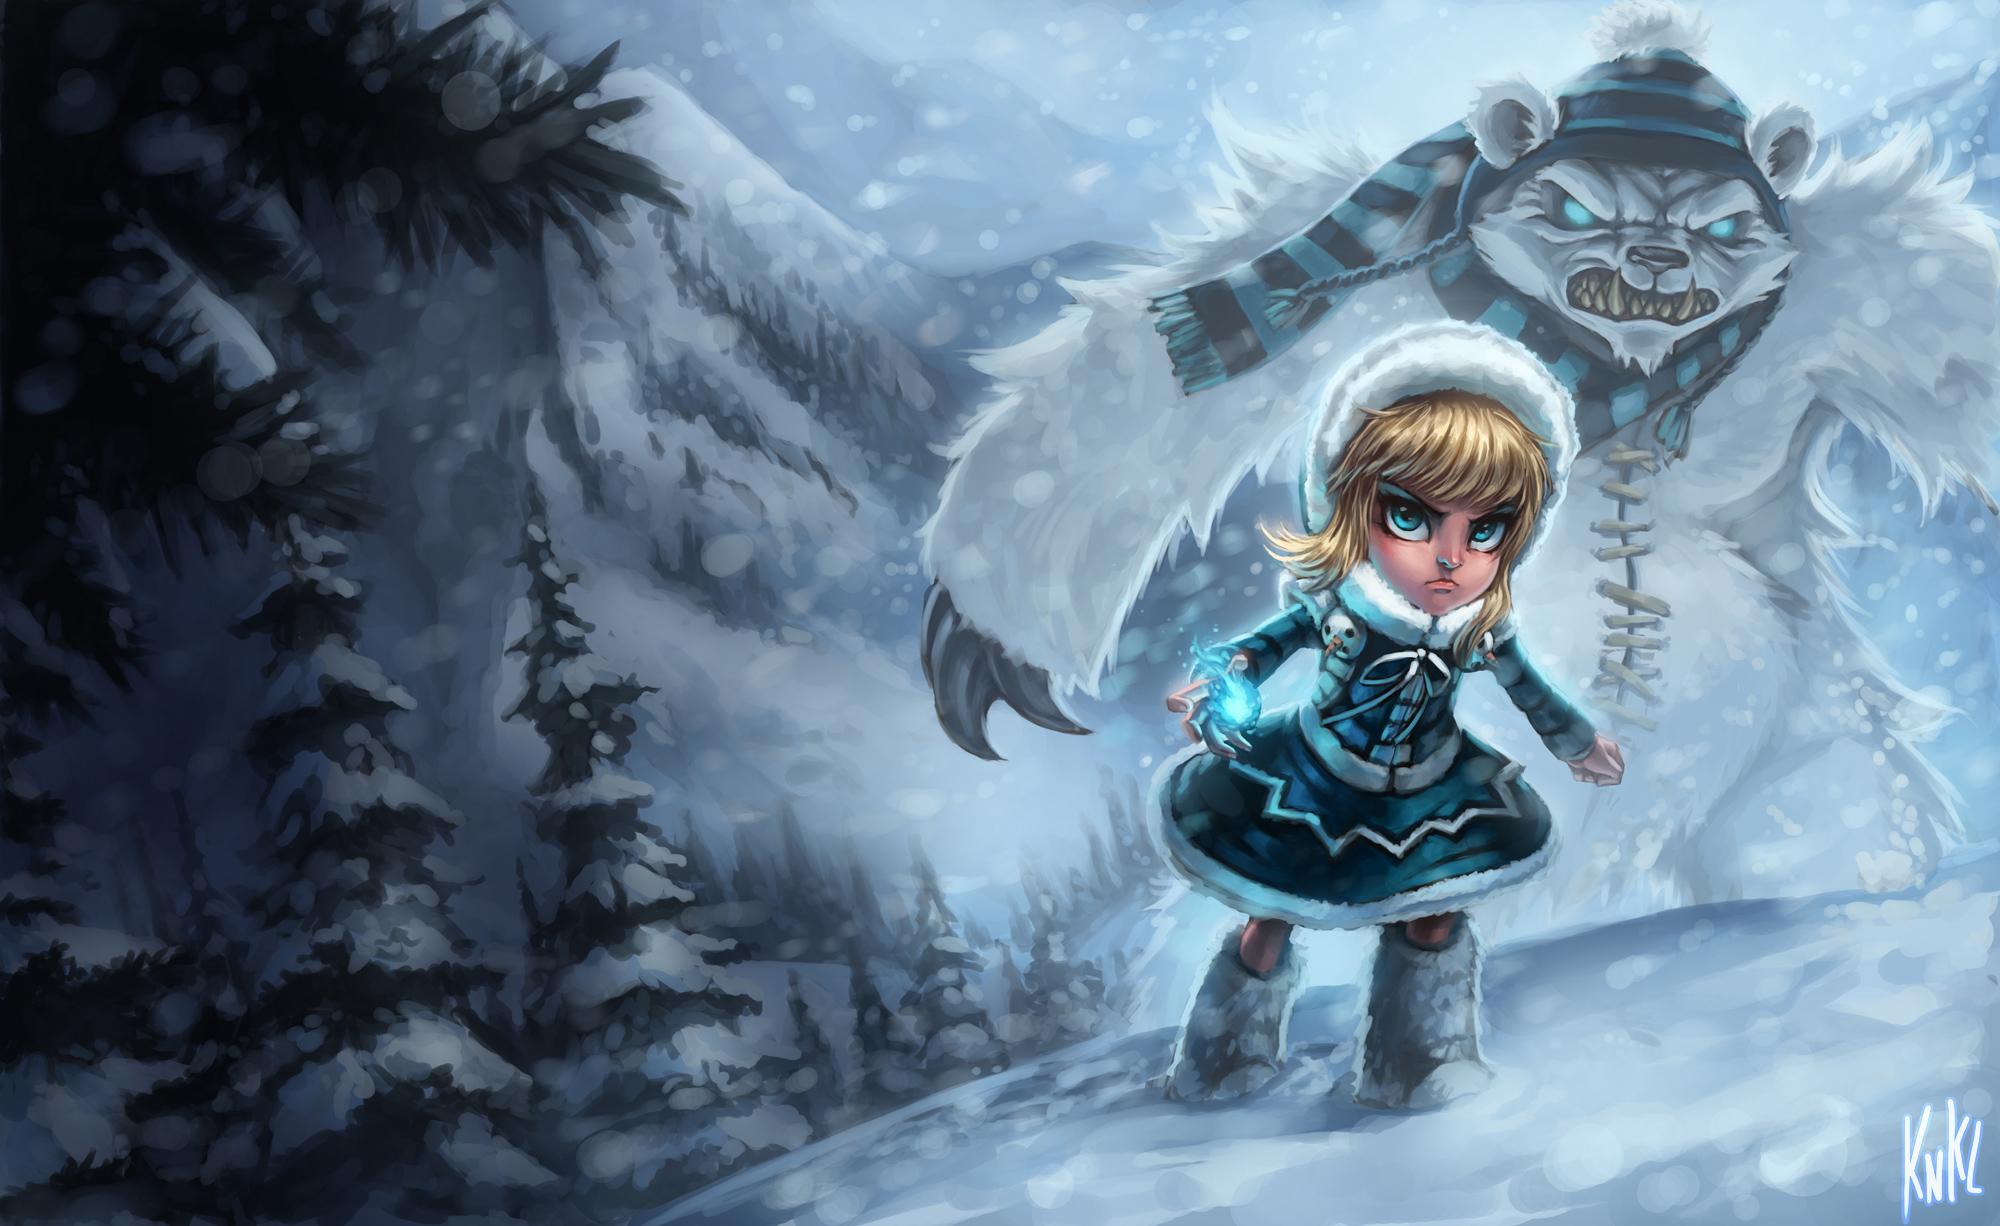 LoL - Frostfire Annie by Knockwurst